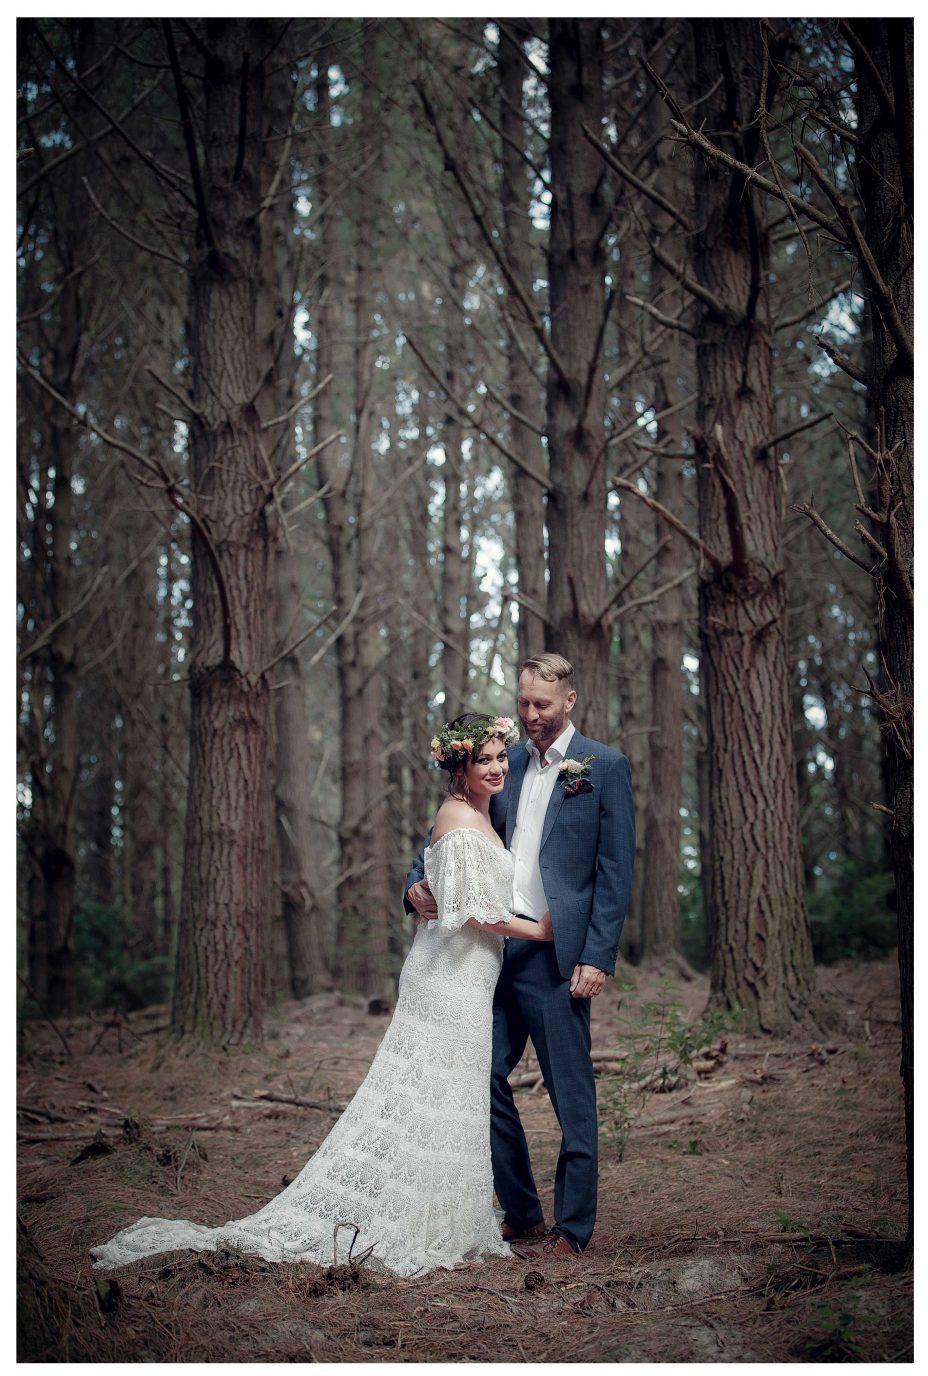 Bride and groom amoung huge trees, Riverhead Forrest wedding photo, Kumeu Valley creative wedding photo